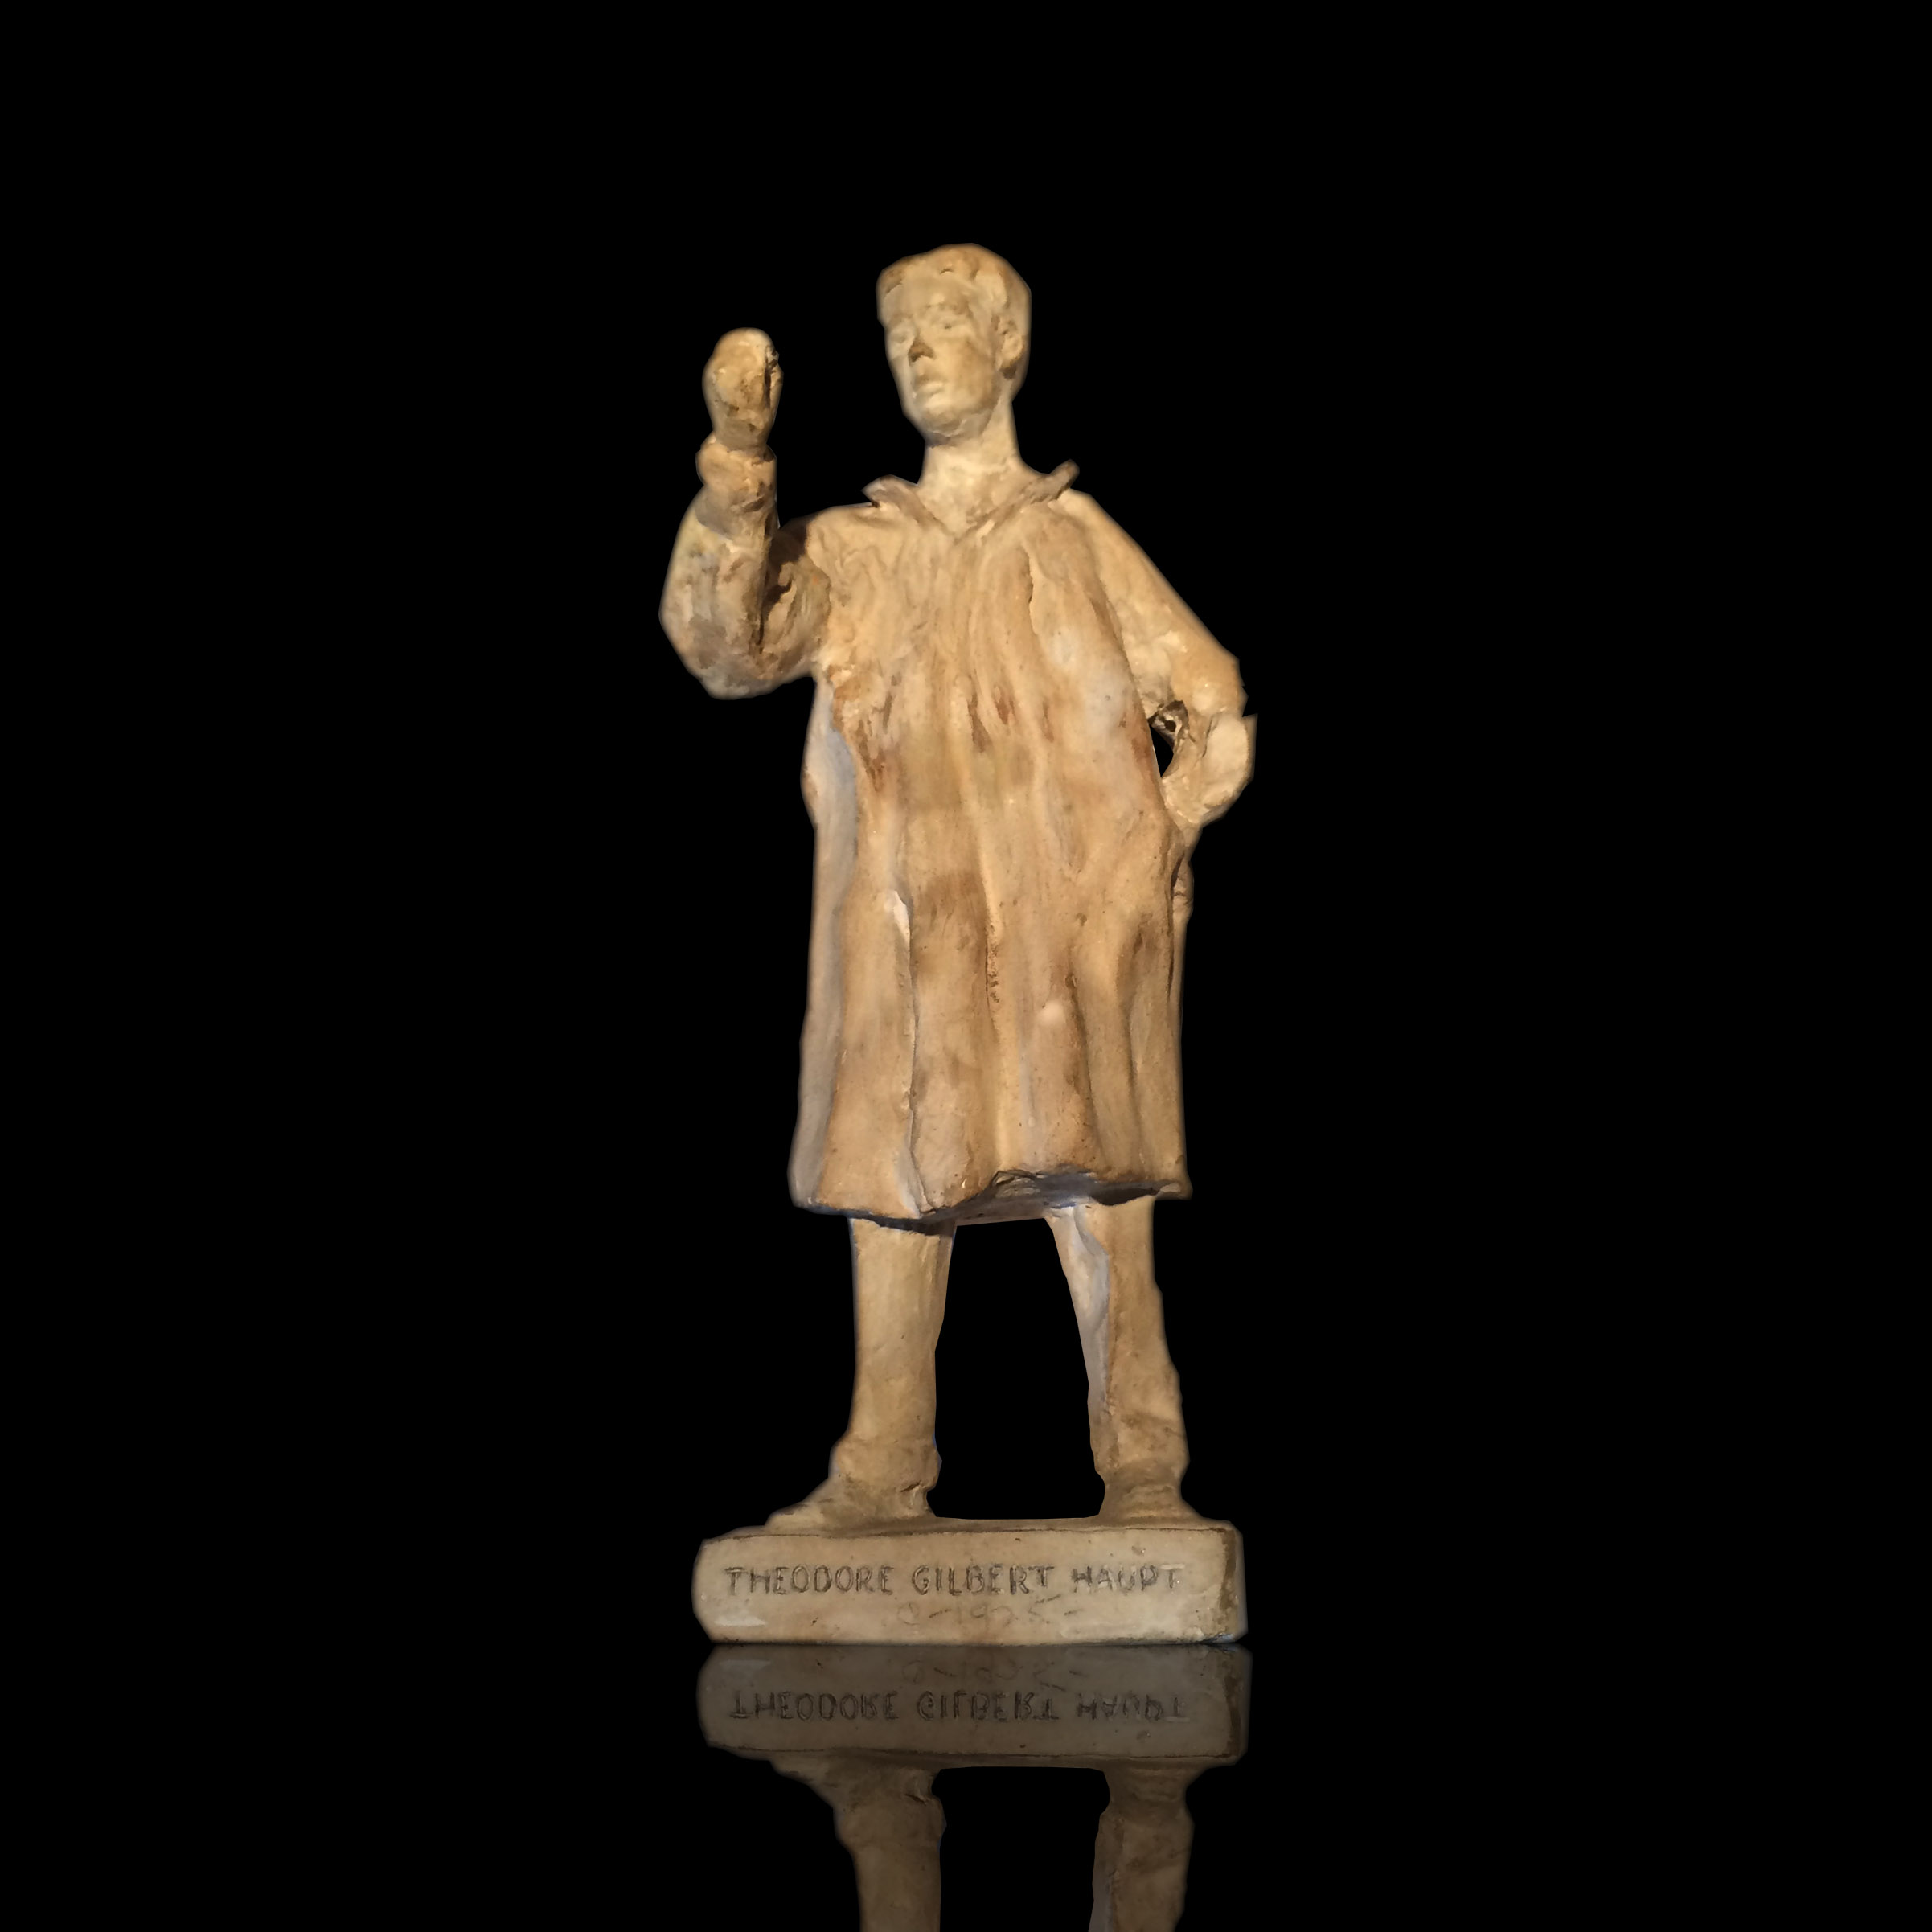 John Steuart Curry (1897-1946) American Regionalism Sculpture of Theodore Gilbert Haupt c.1925